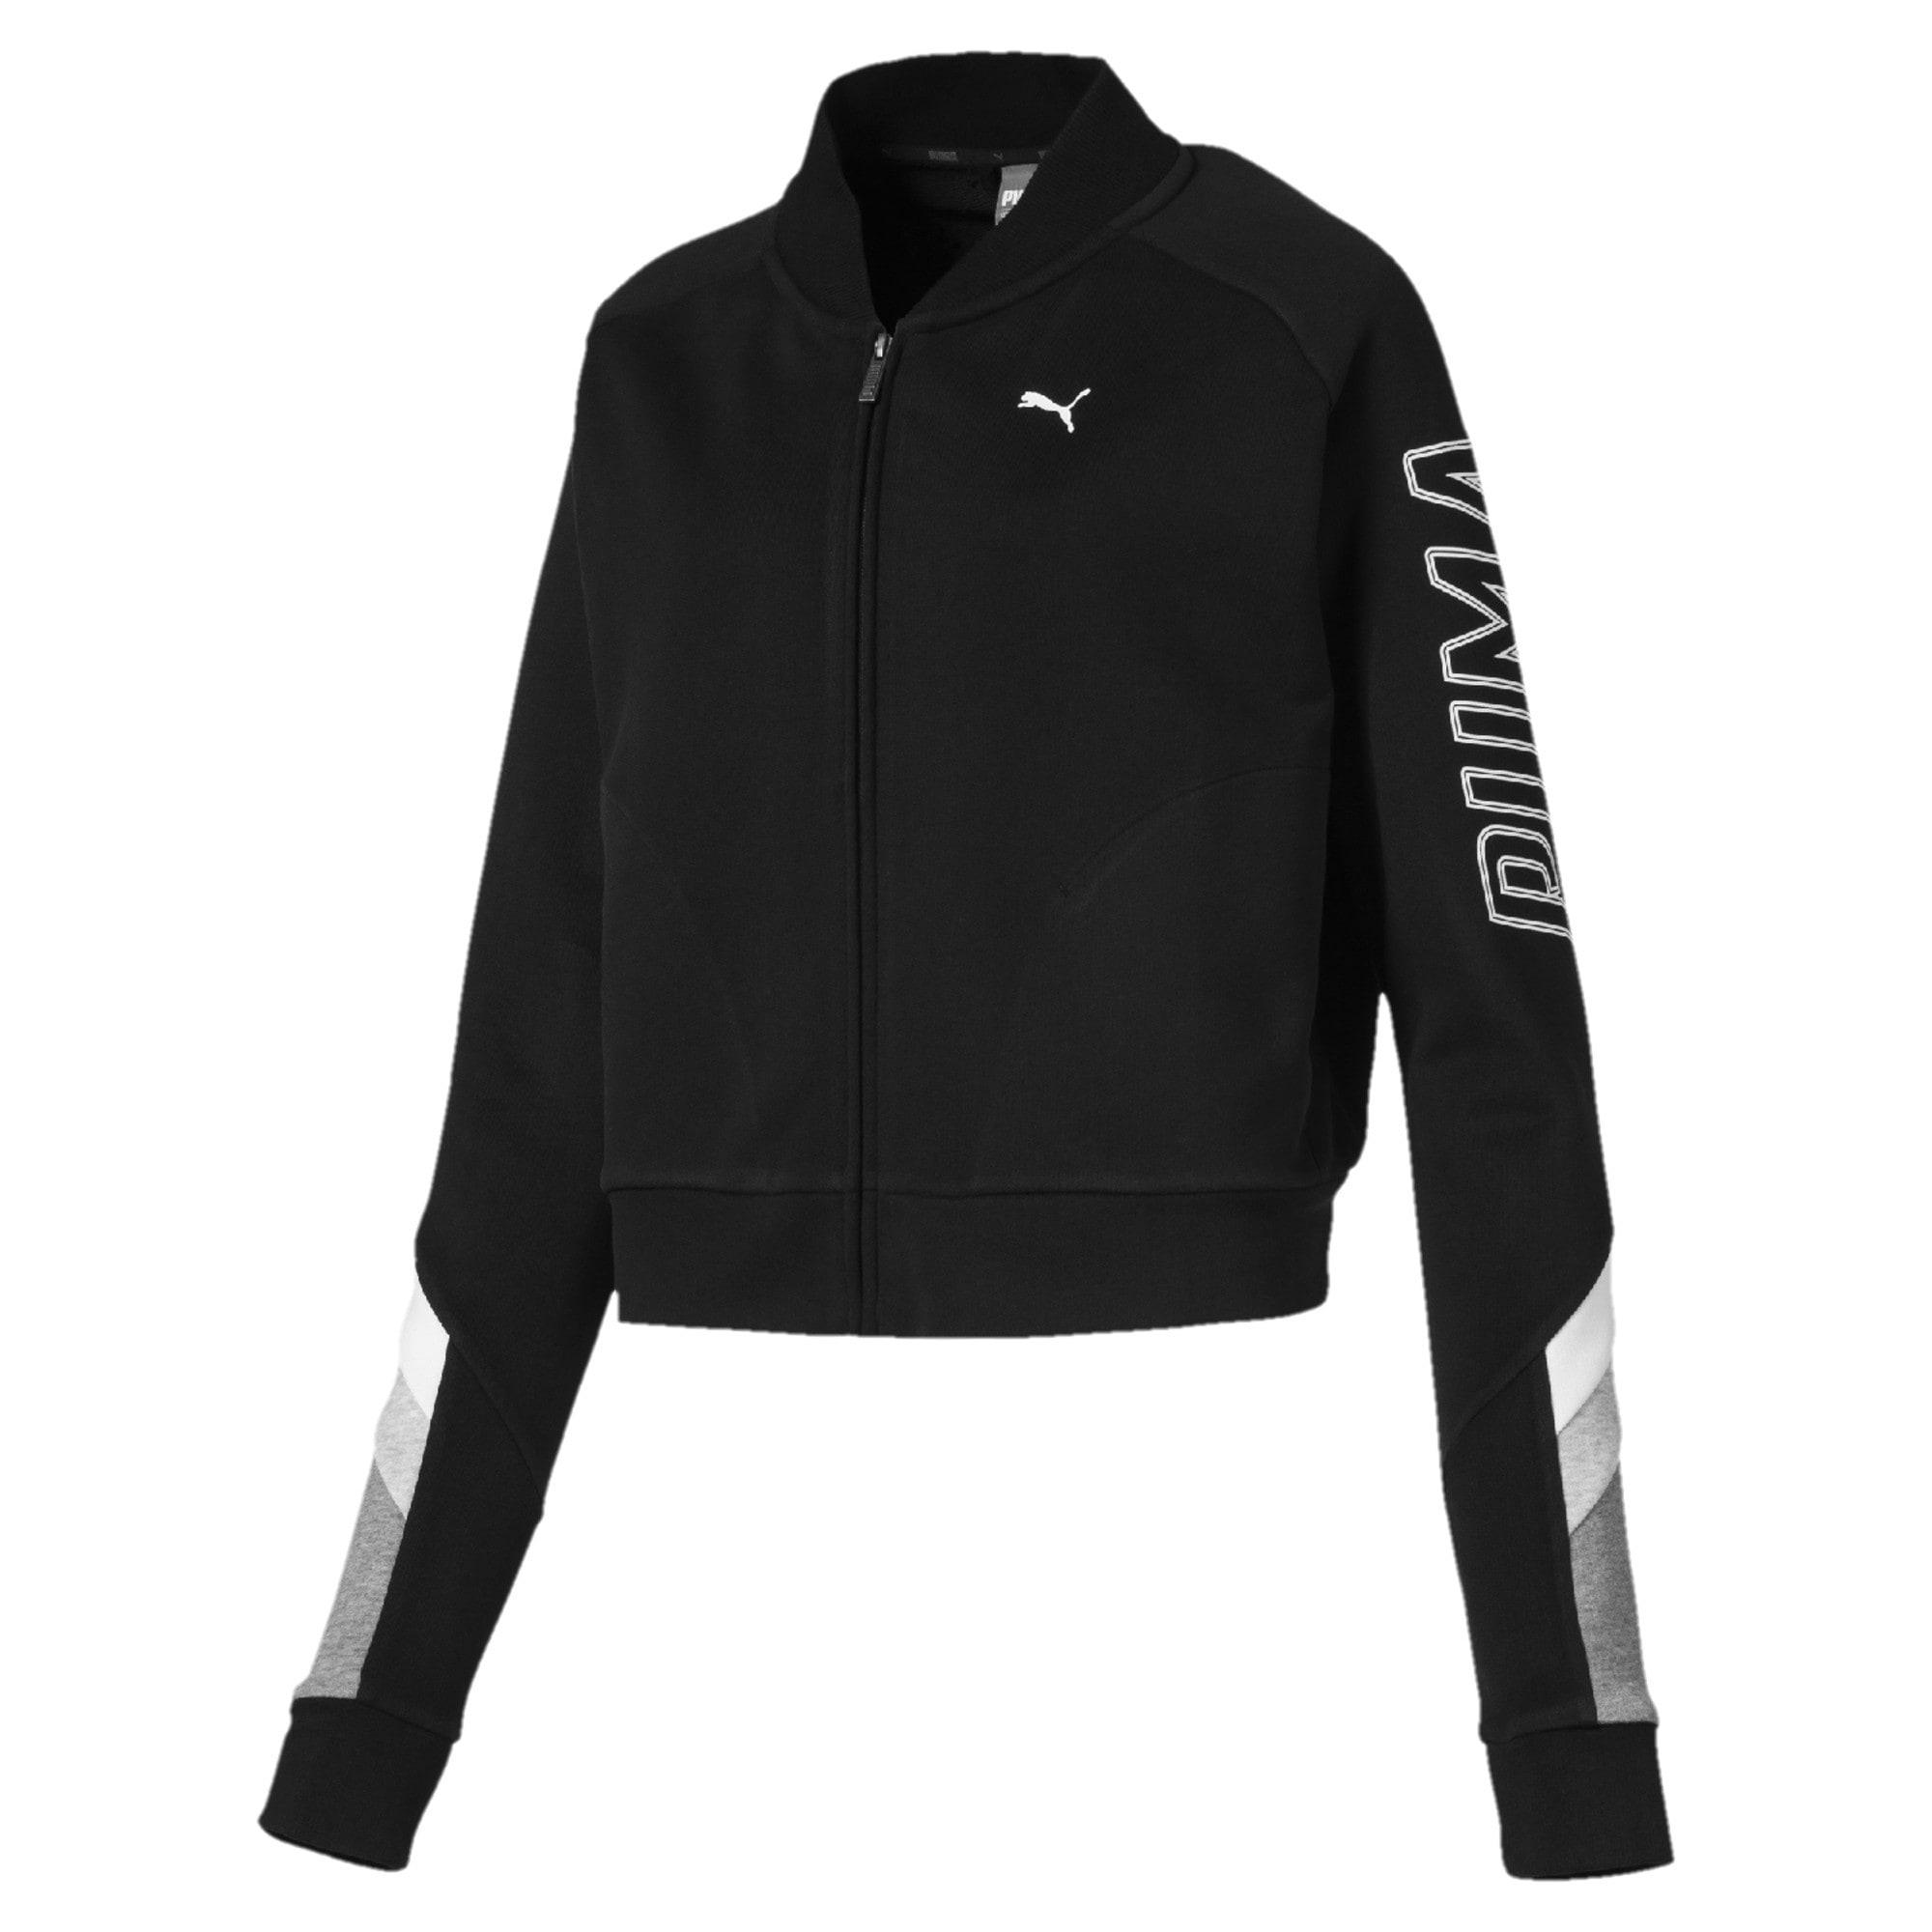 Thumbnail 4 of Athletics Bomber Jacket, Cotton Black, medium